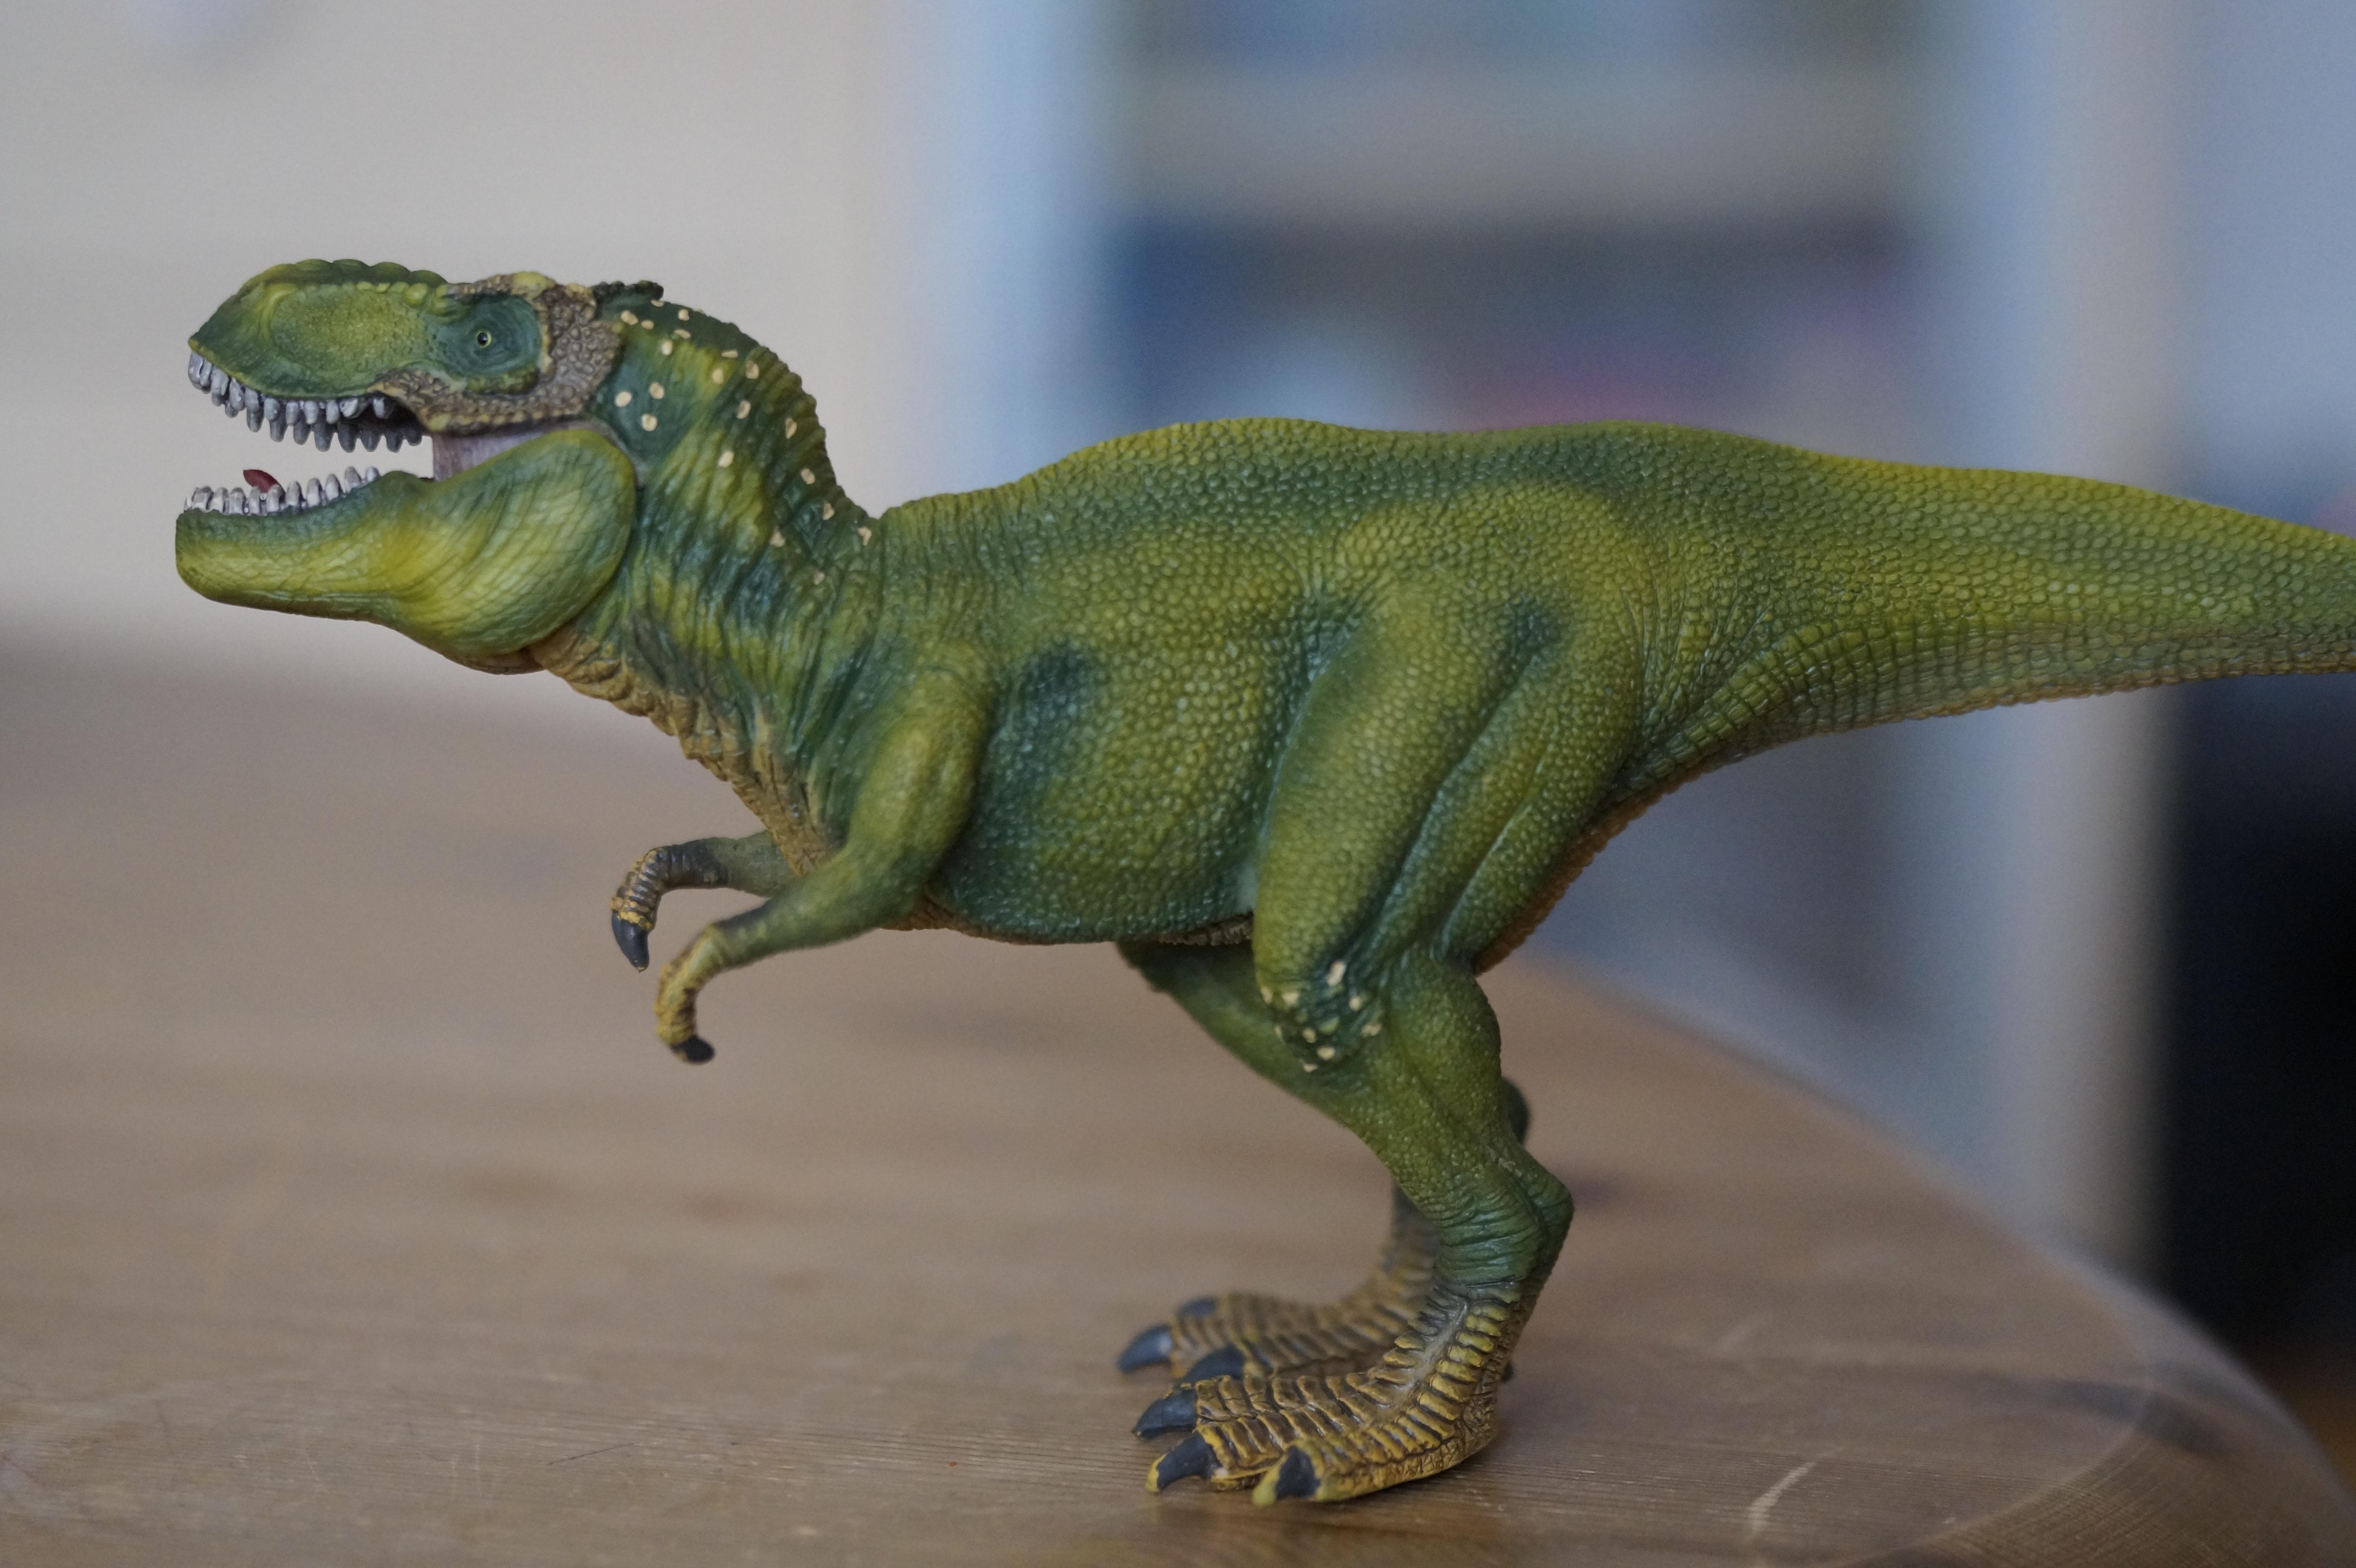 Bildet Dyr Rovdyret Reptil Fauna Tyrannosaurus Rex Barn